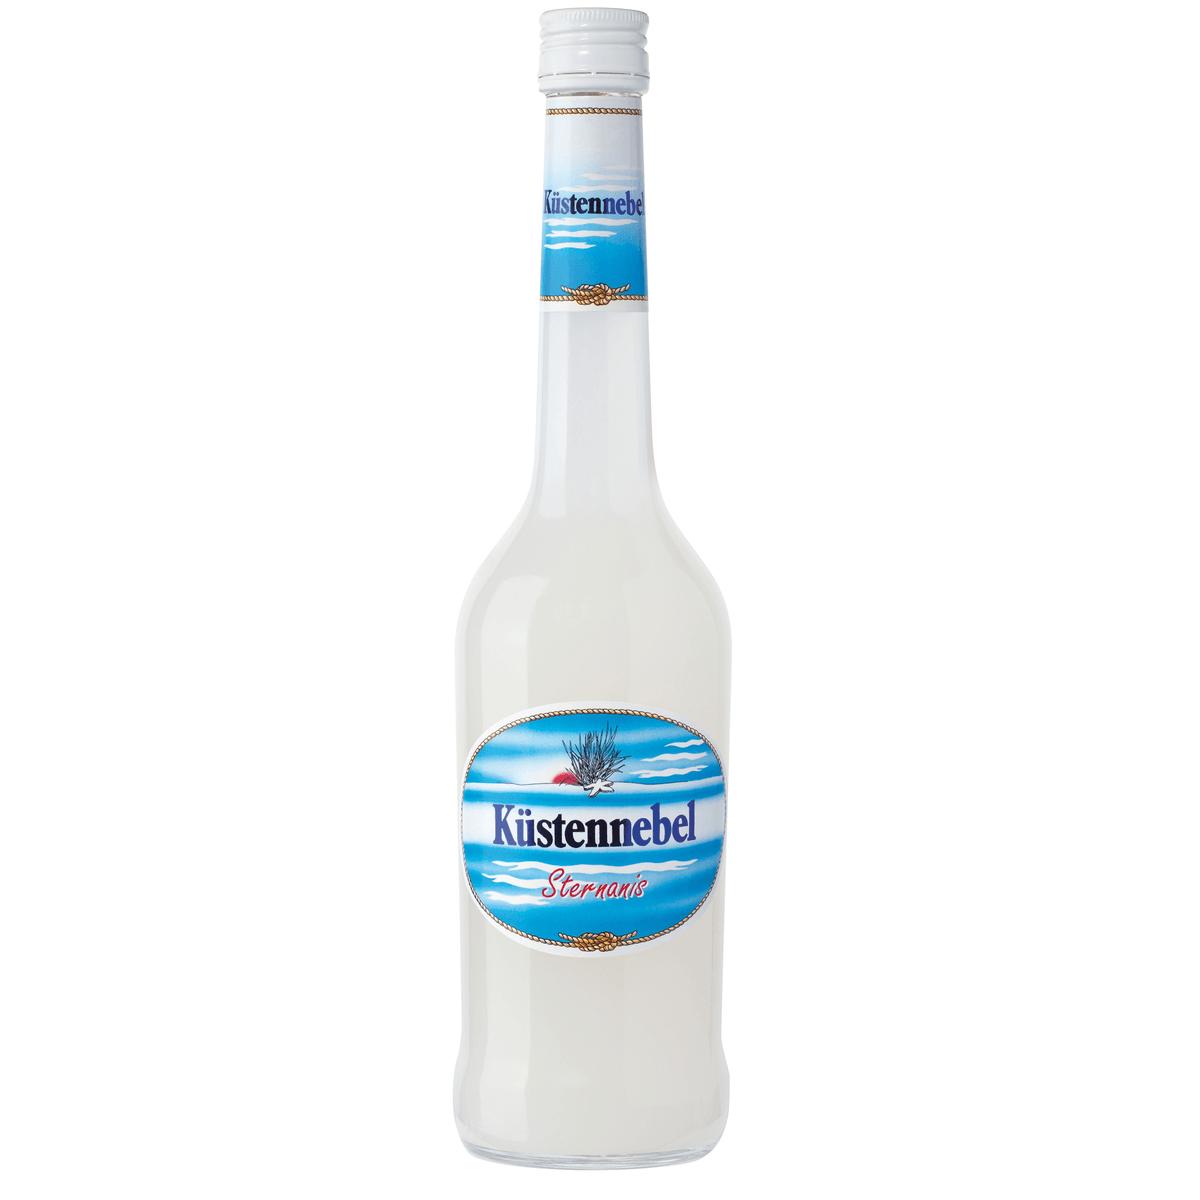 Küstennebel 21,8% 0,5L   Liköre   Spirituosen   Sortiment   Trinkgut